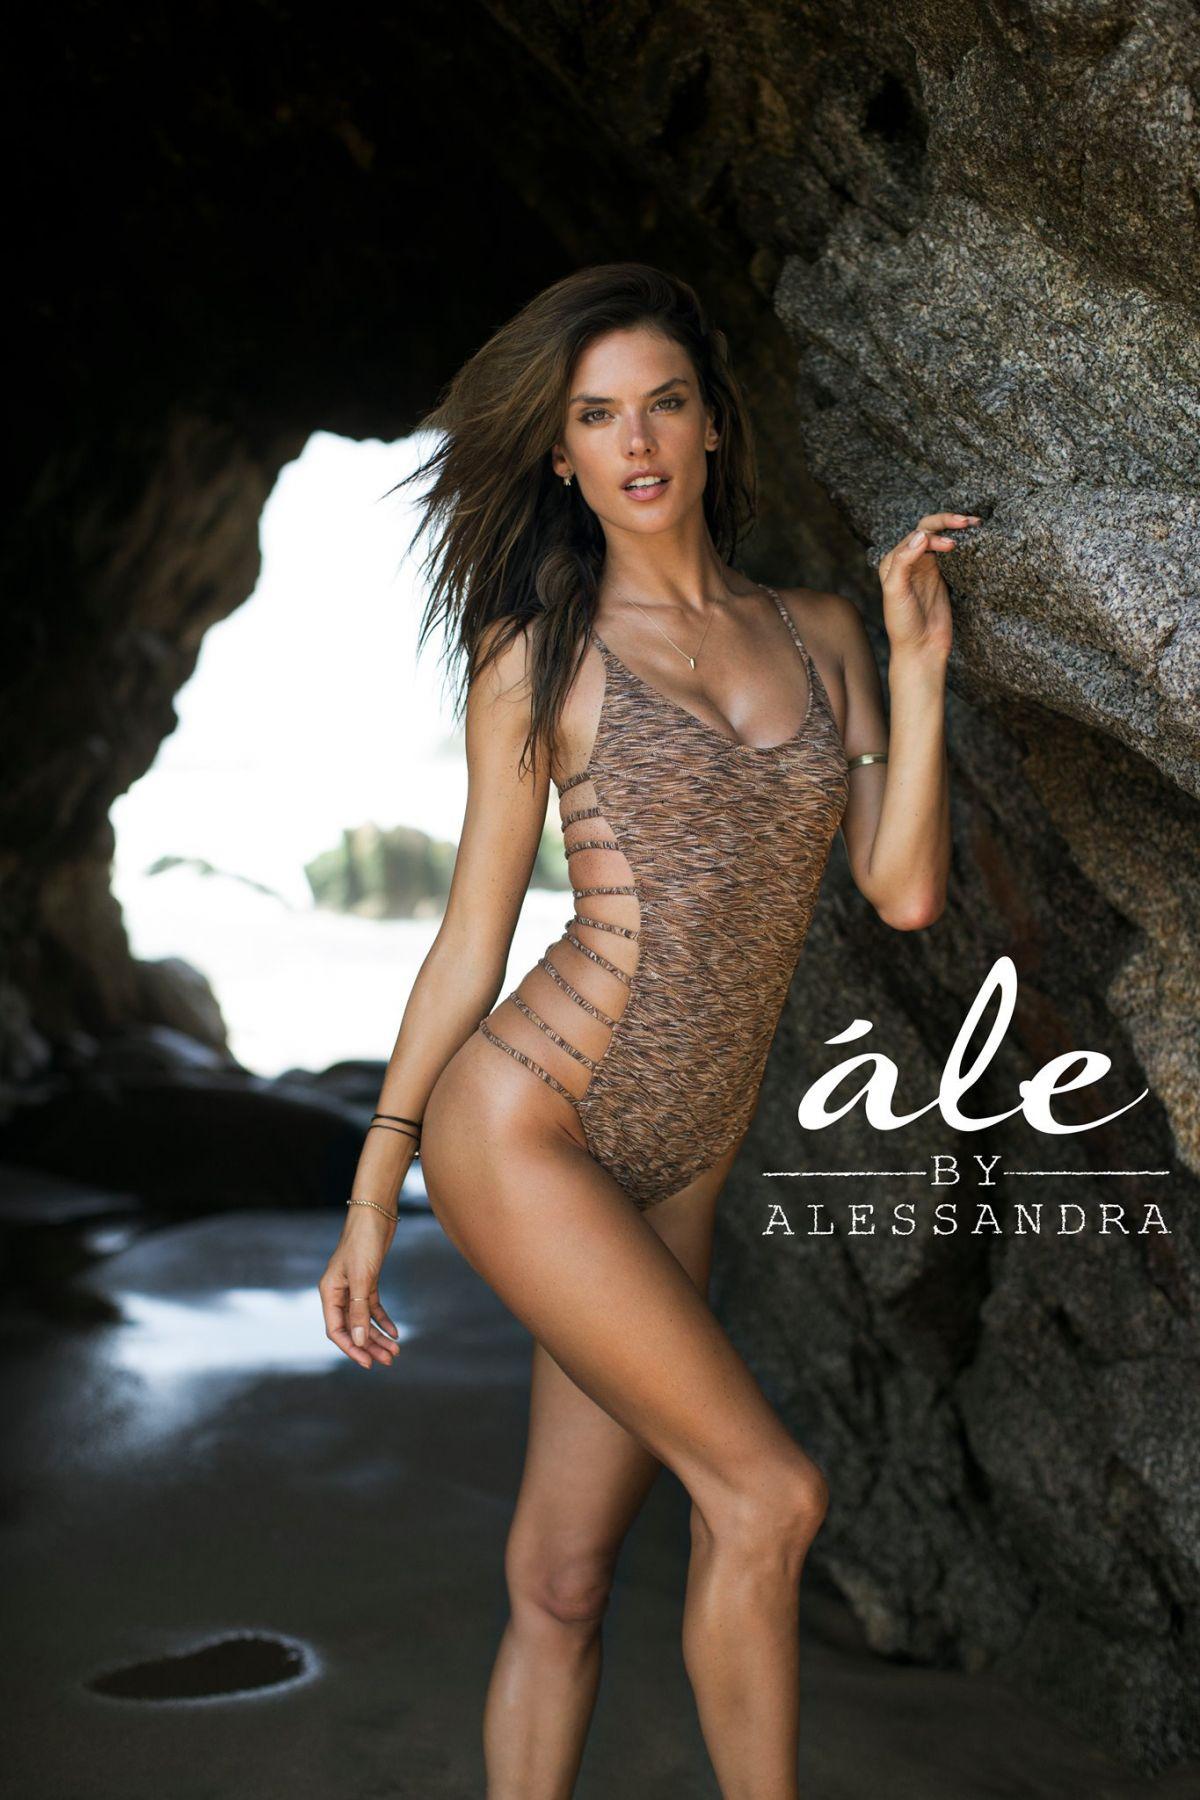 ALESSANDRA AMBROSIO - Ale by Alessandra Swimwear